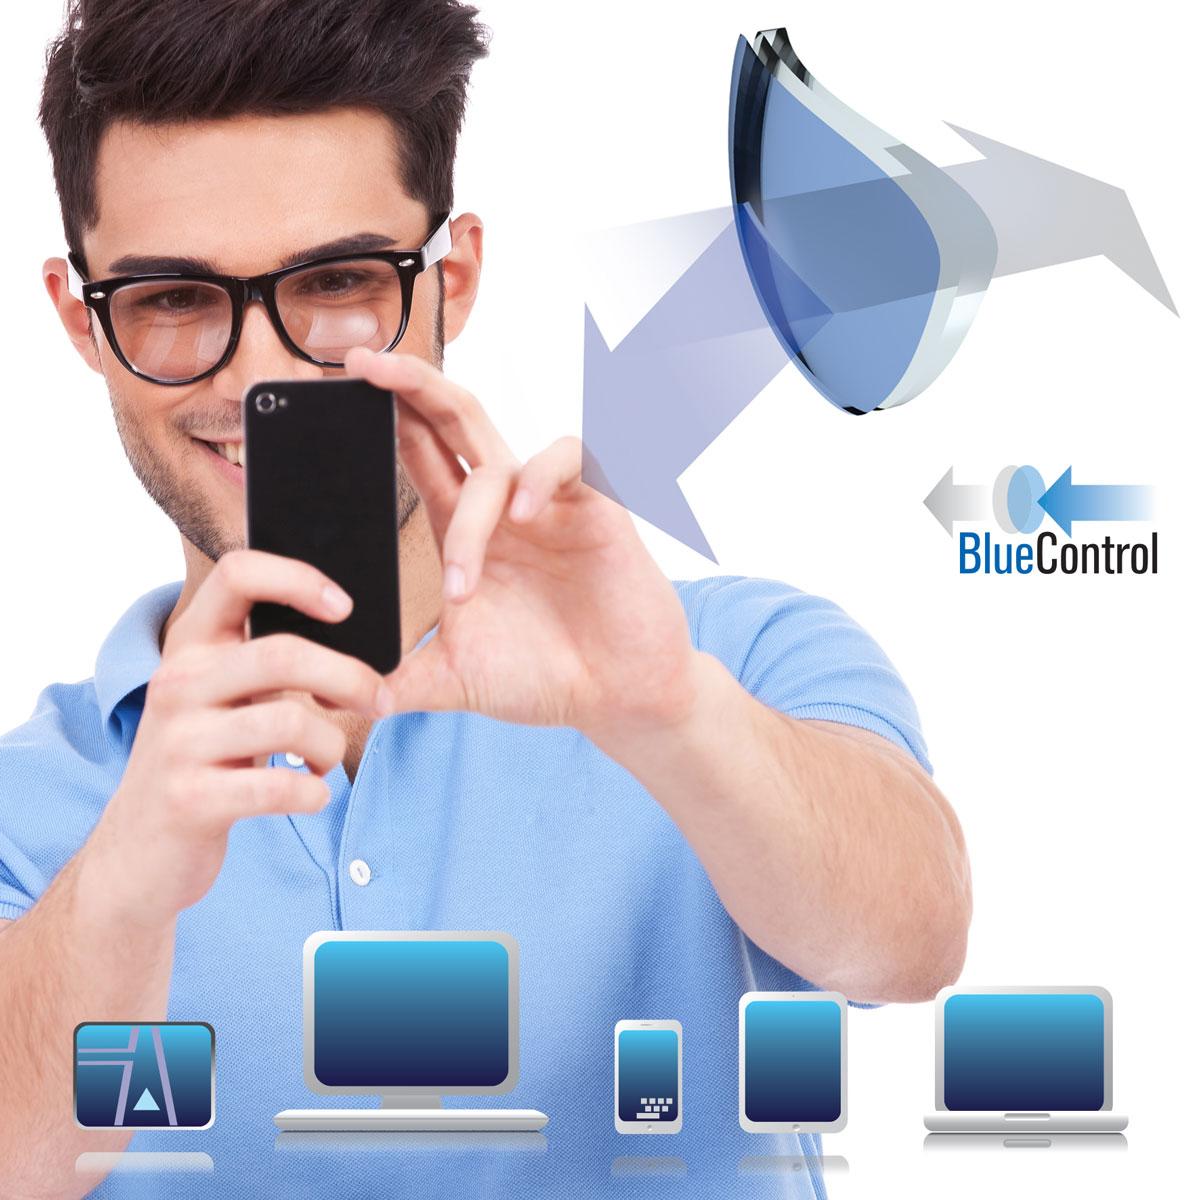 Hoya BlueControl